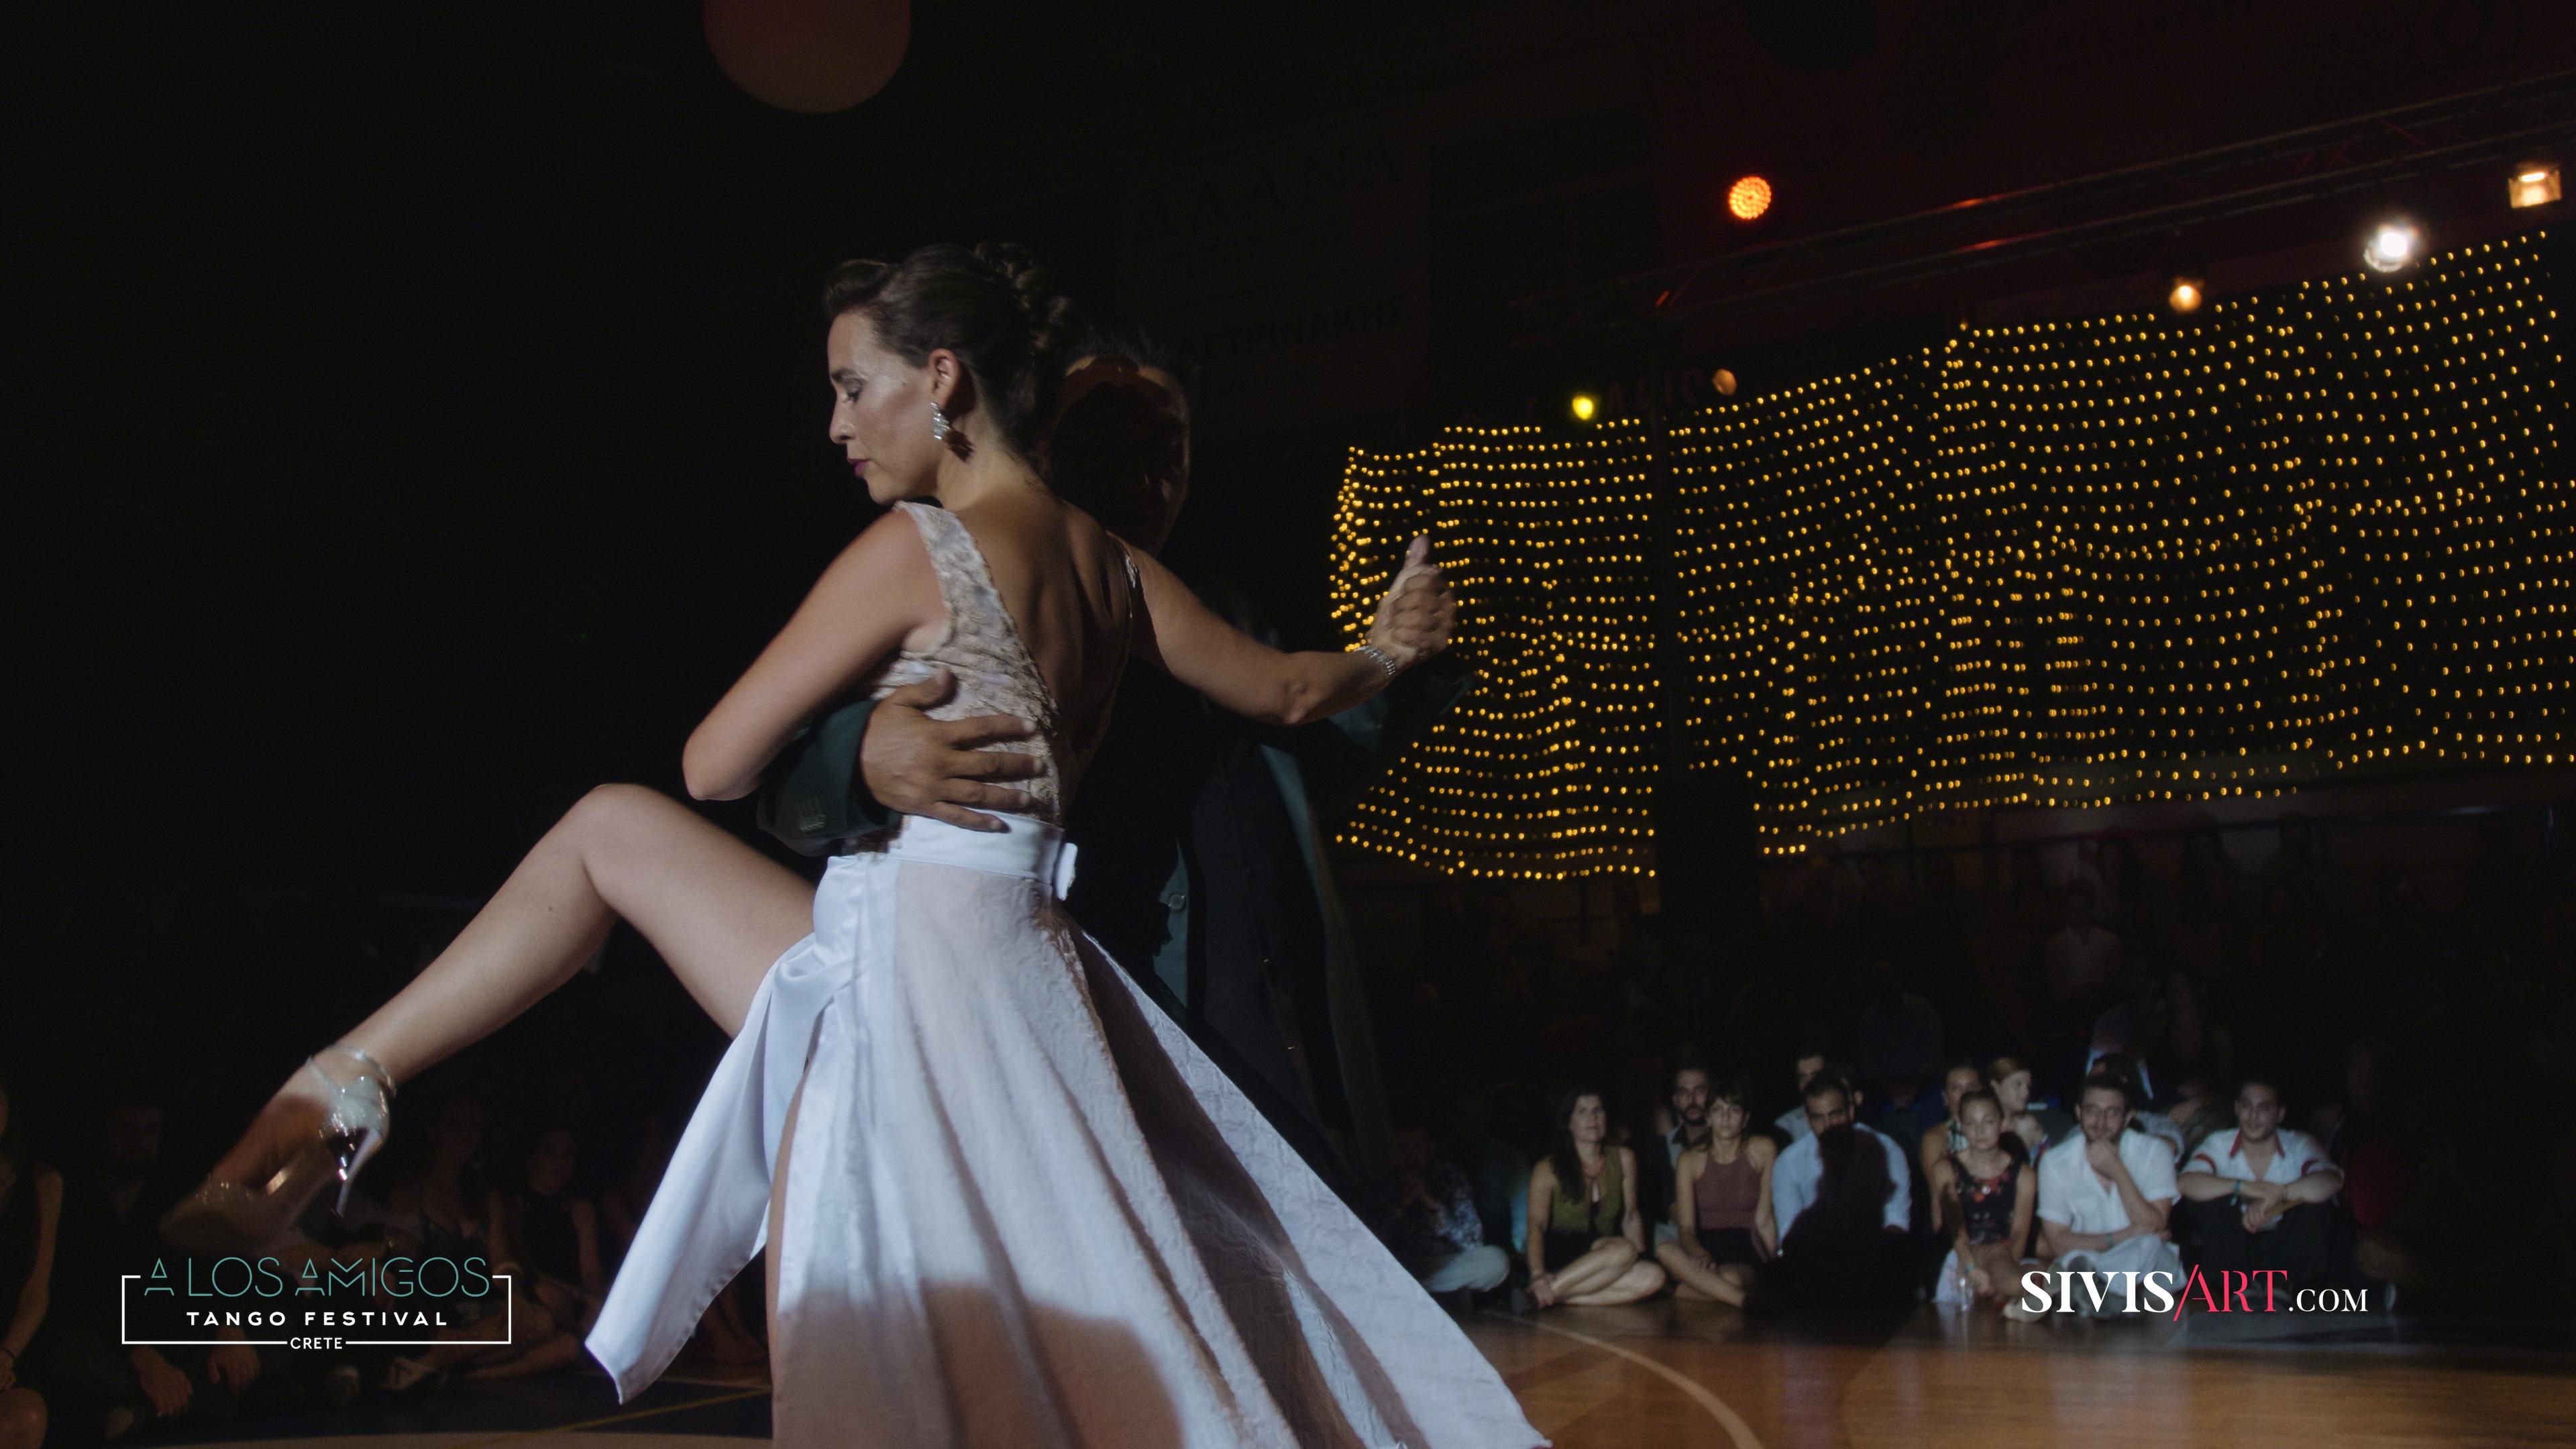 Sivis'art Videomaker presents Mariano Chicho Frúmboli & Juana Sepulveda